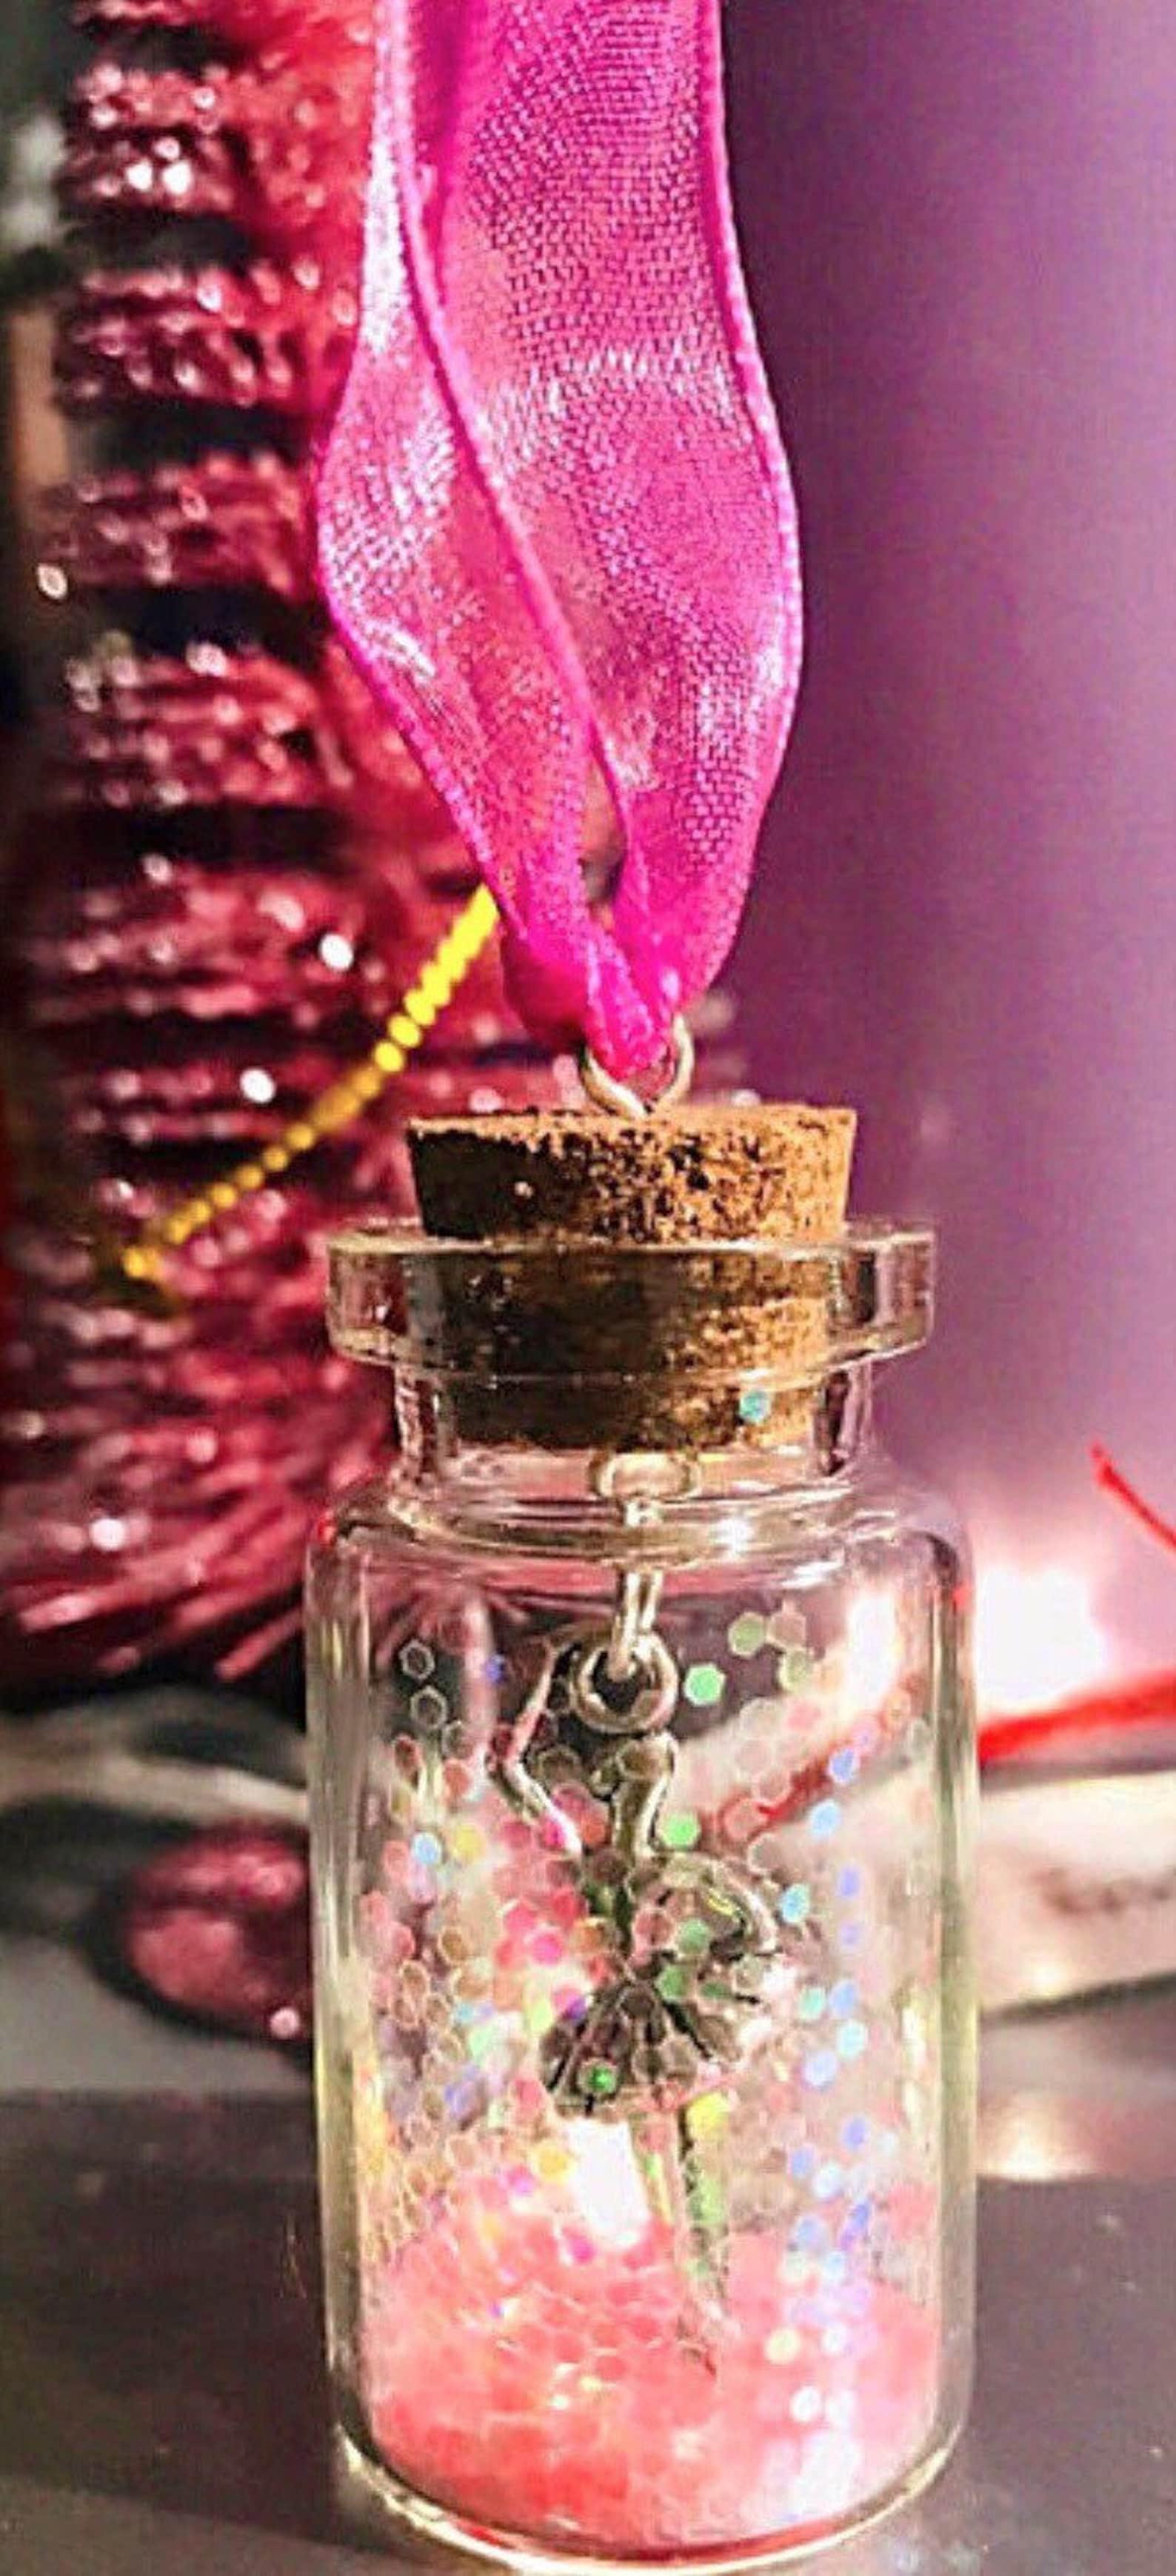 ballerina sparkle decoration girls gift pink magical christmas tree hanging decoration sparkle ballet gift festive ballet dancer